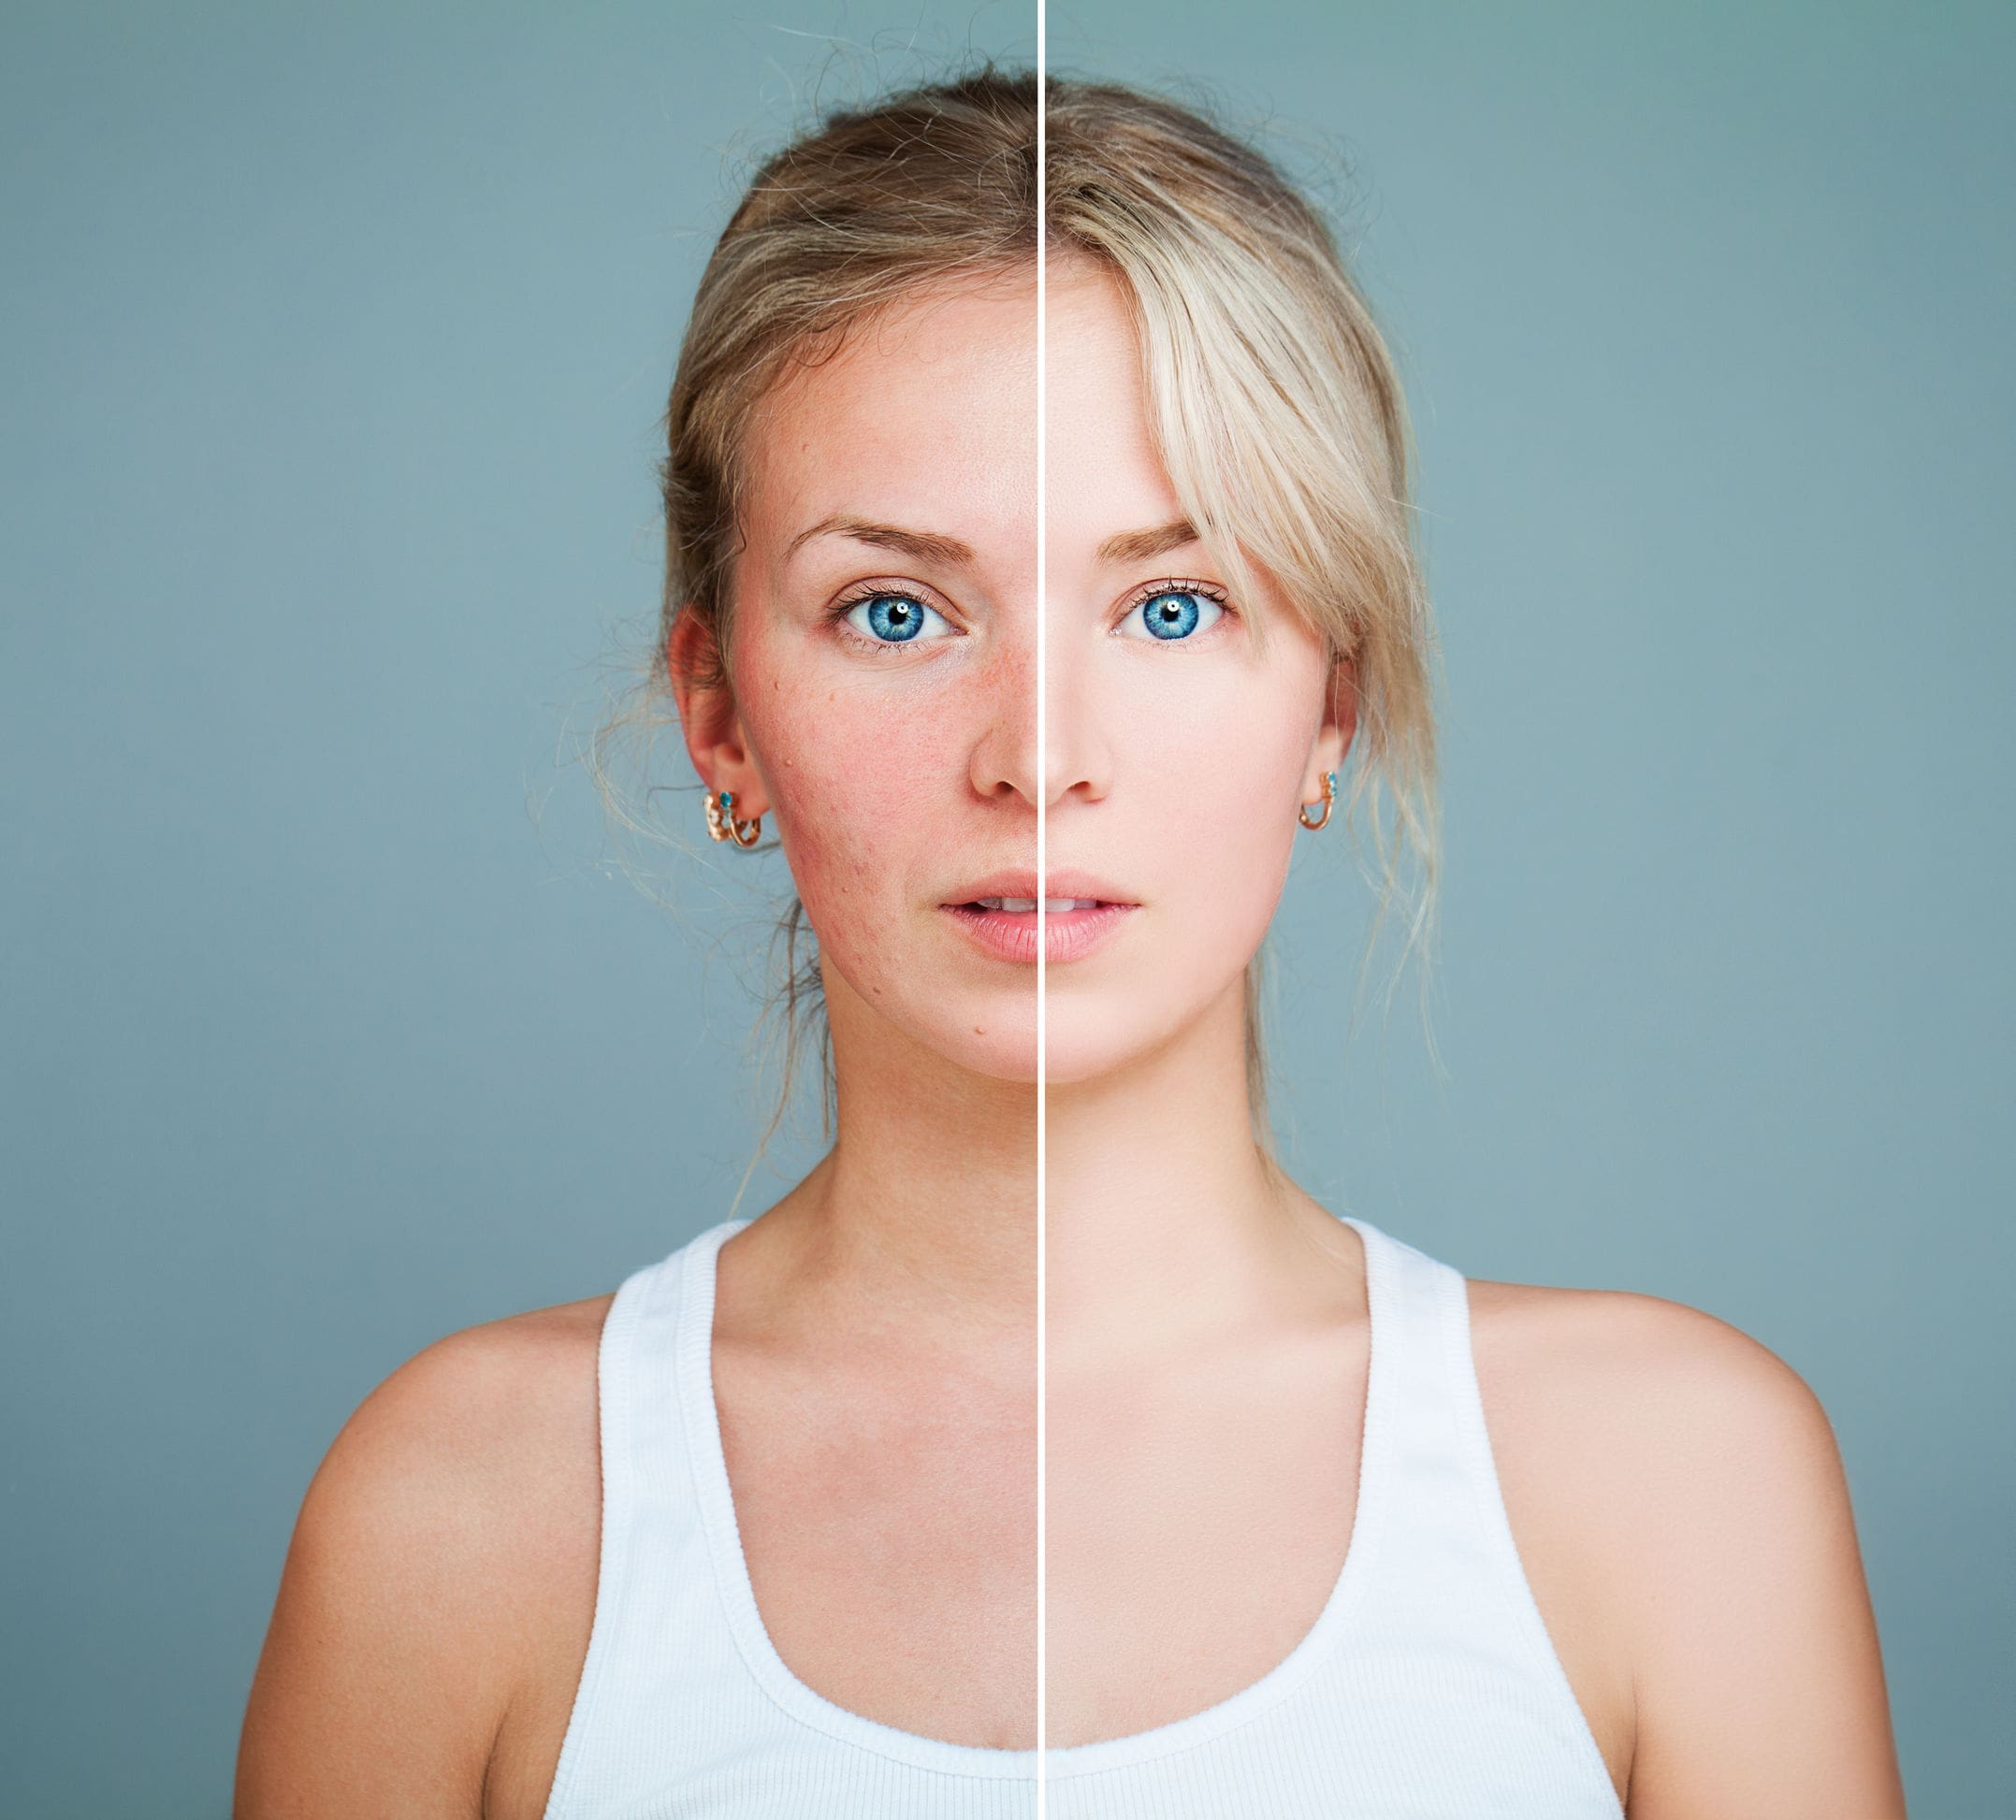 Pelle sensibile e couperose cause e rimedi naturali